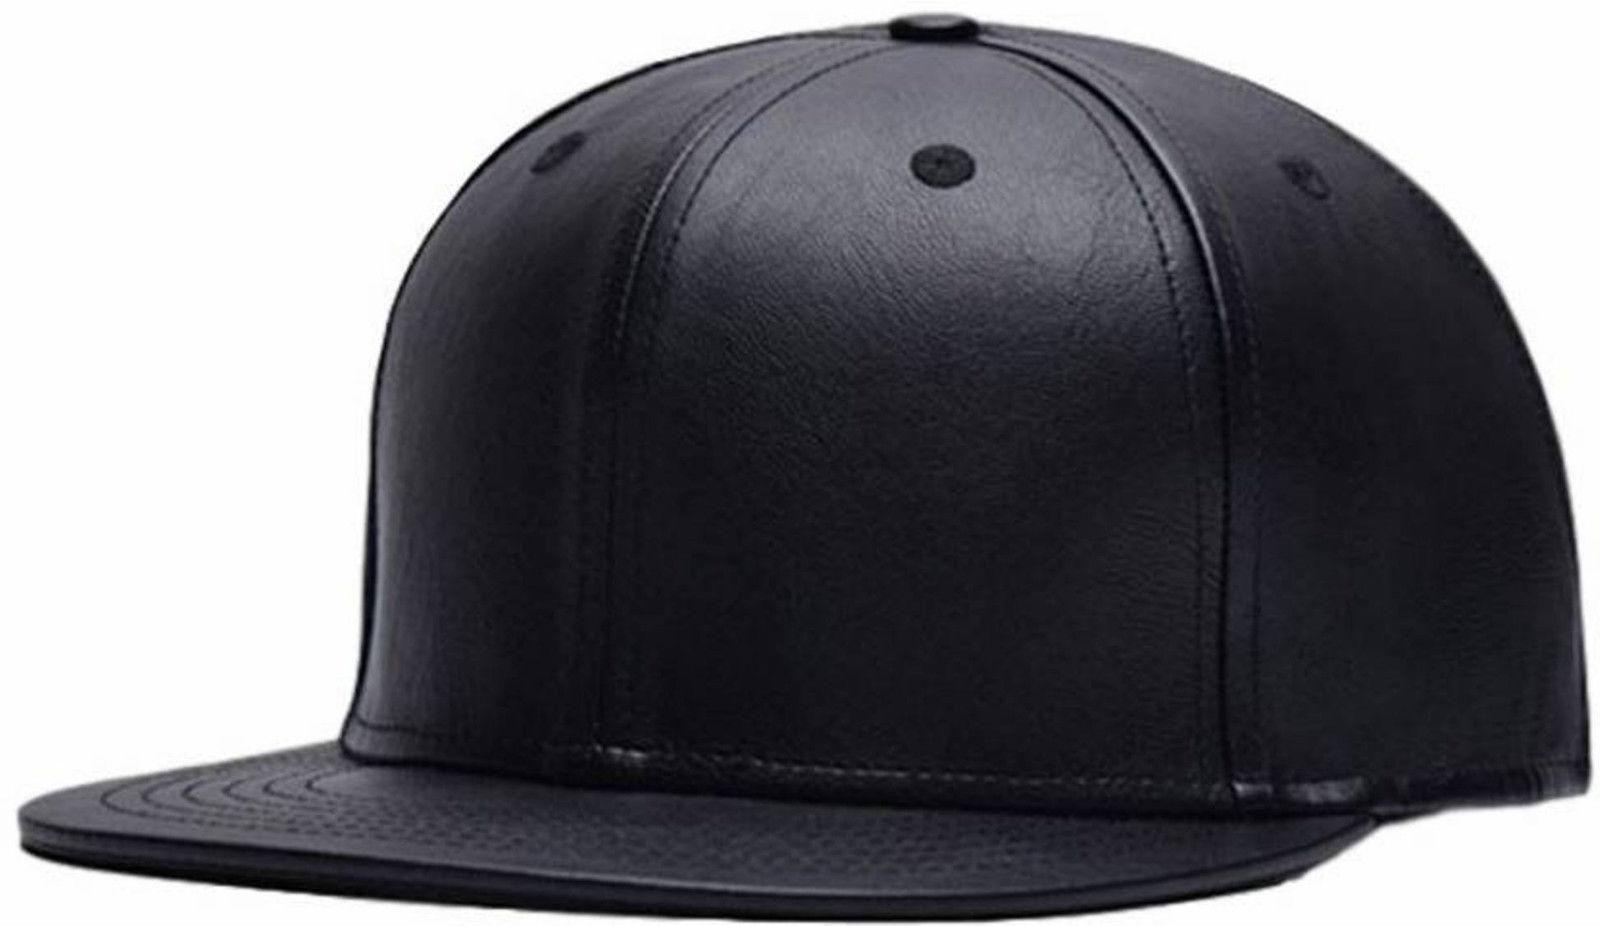 MOCOMO Leather Hiphop Cap Solid Black Cap Hat For Men Women Boys Girls